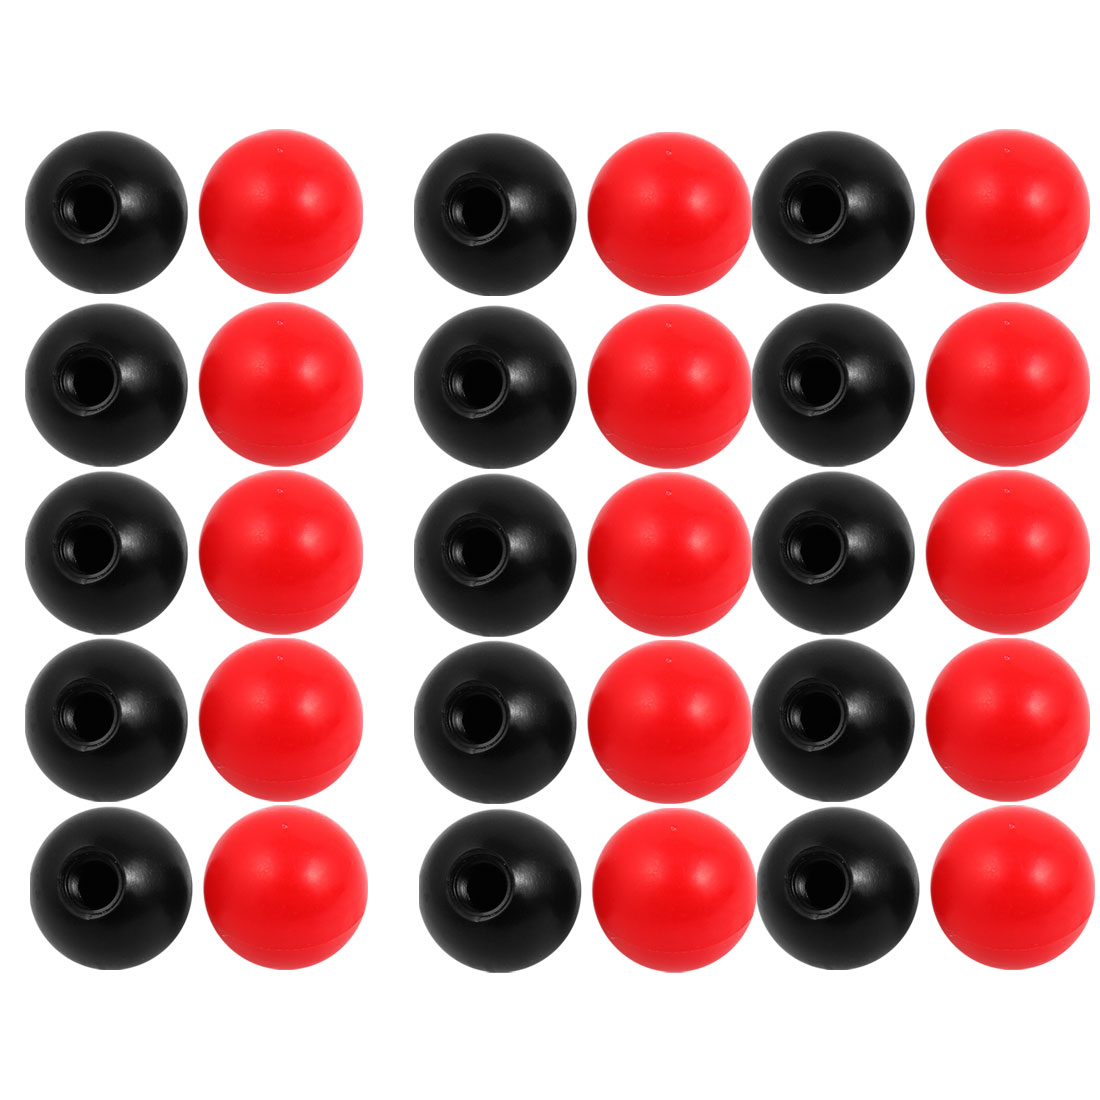 30Pcs Plastic Round Handle Ball Knob M12 Threaded 40mm Dia Mixed Color